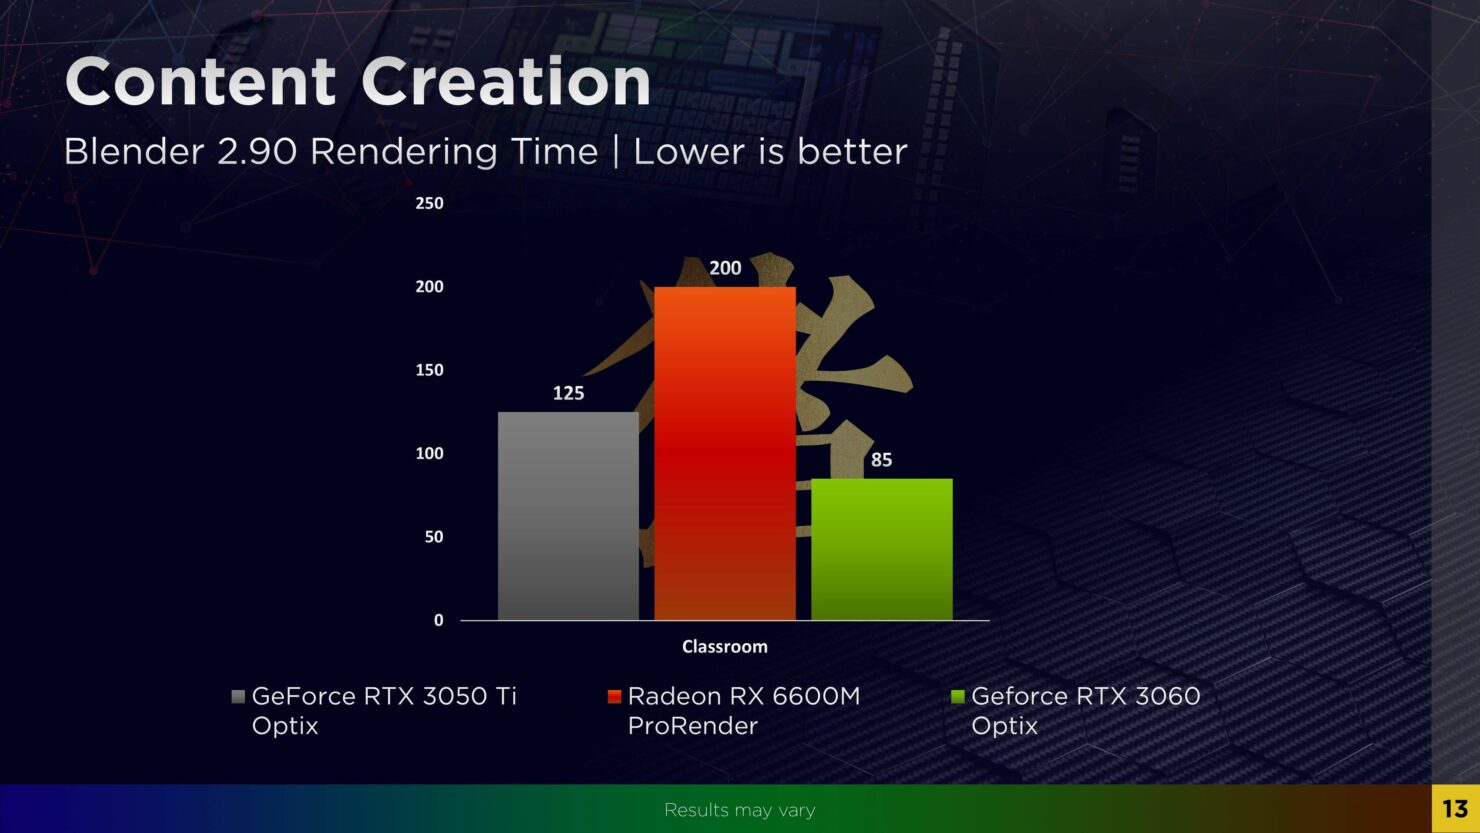 amd-radeon-rx-6600m-navi-23-rdna-2-gpu-content-creation-3